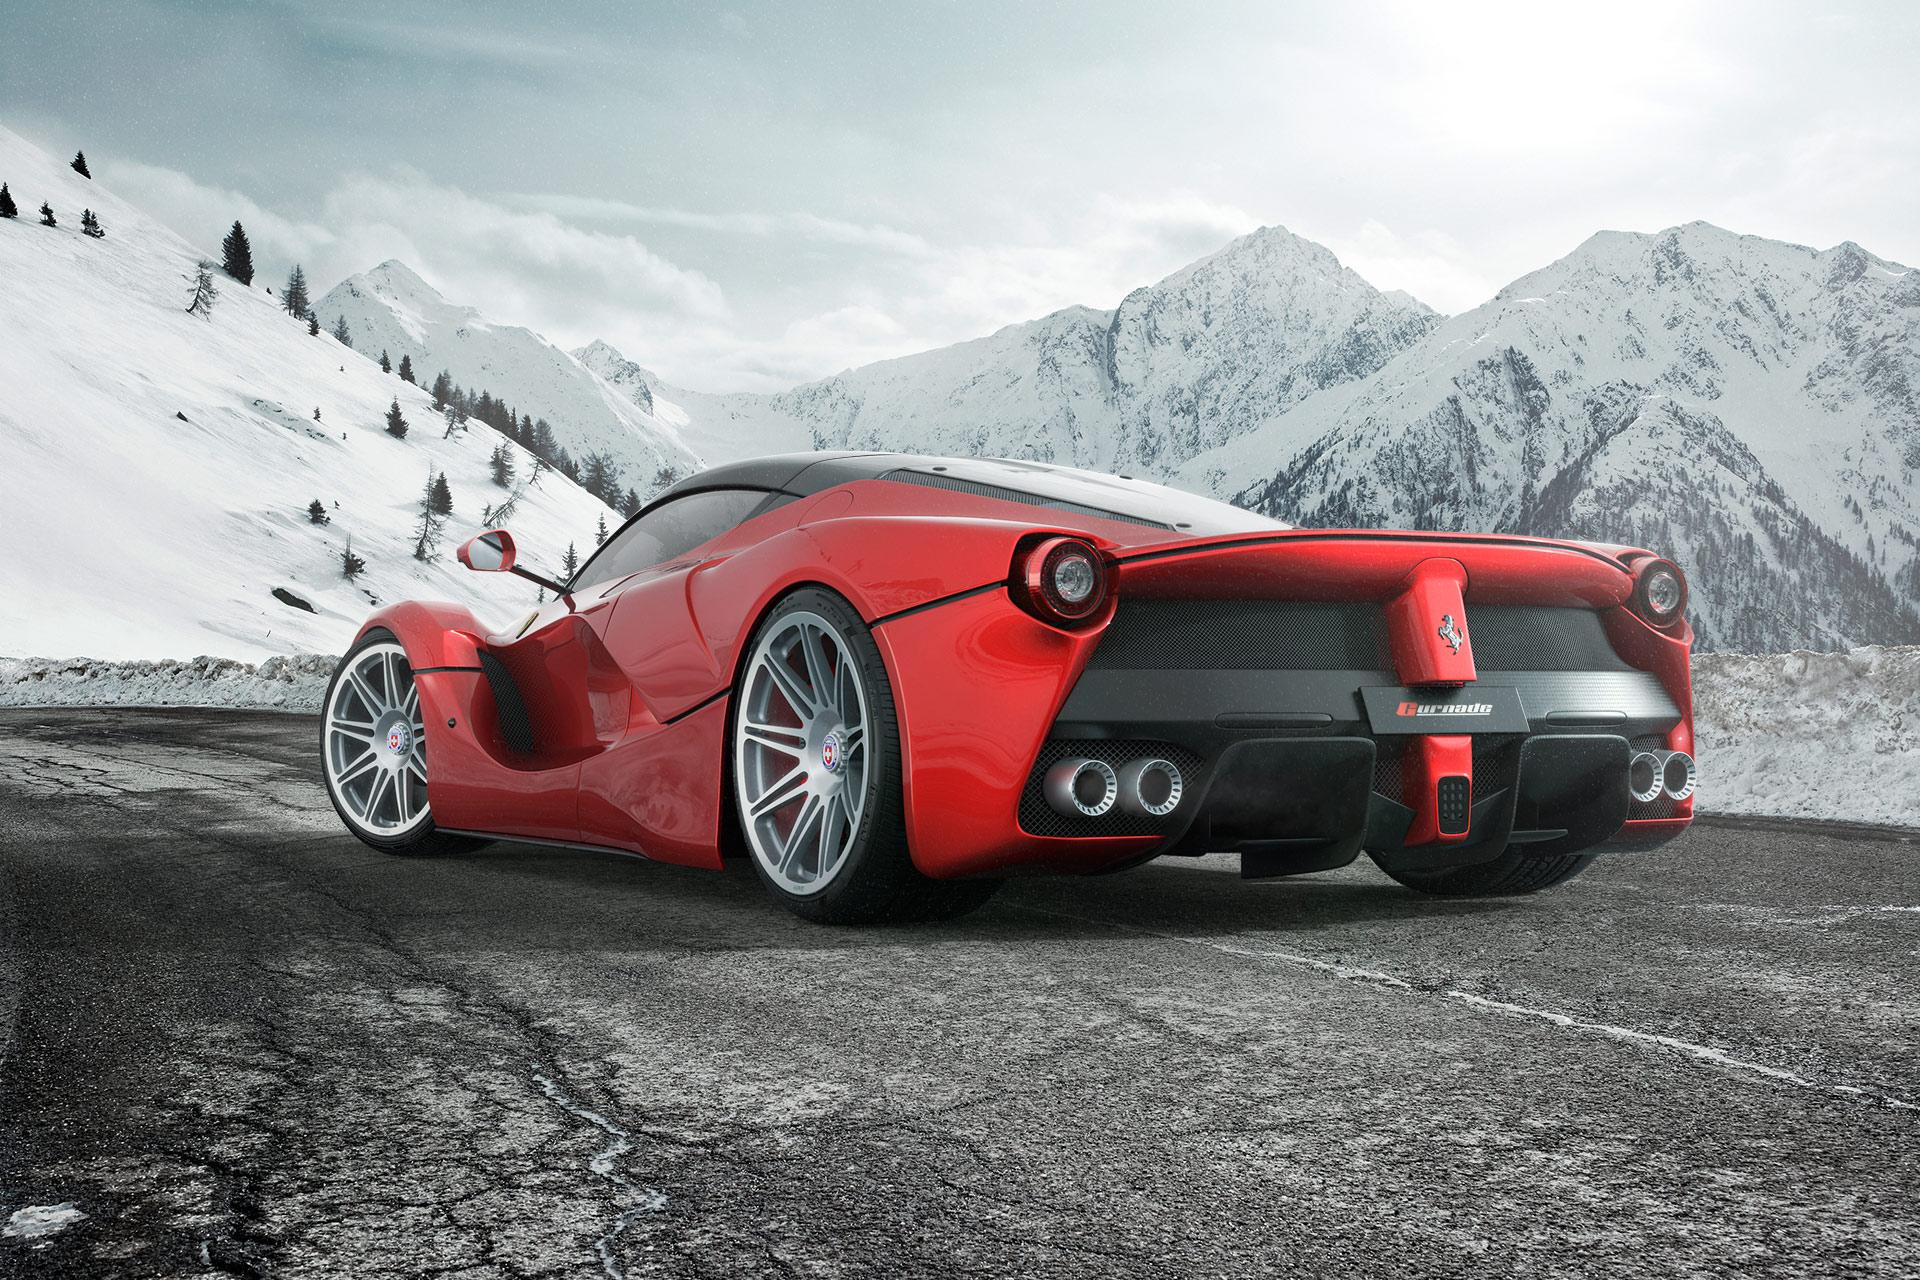 Gurnade Ferrari LaFerrari